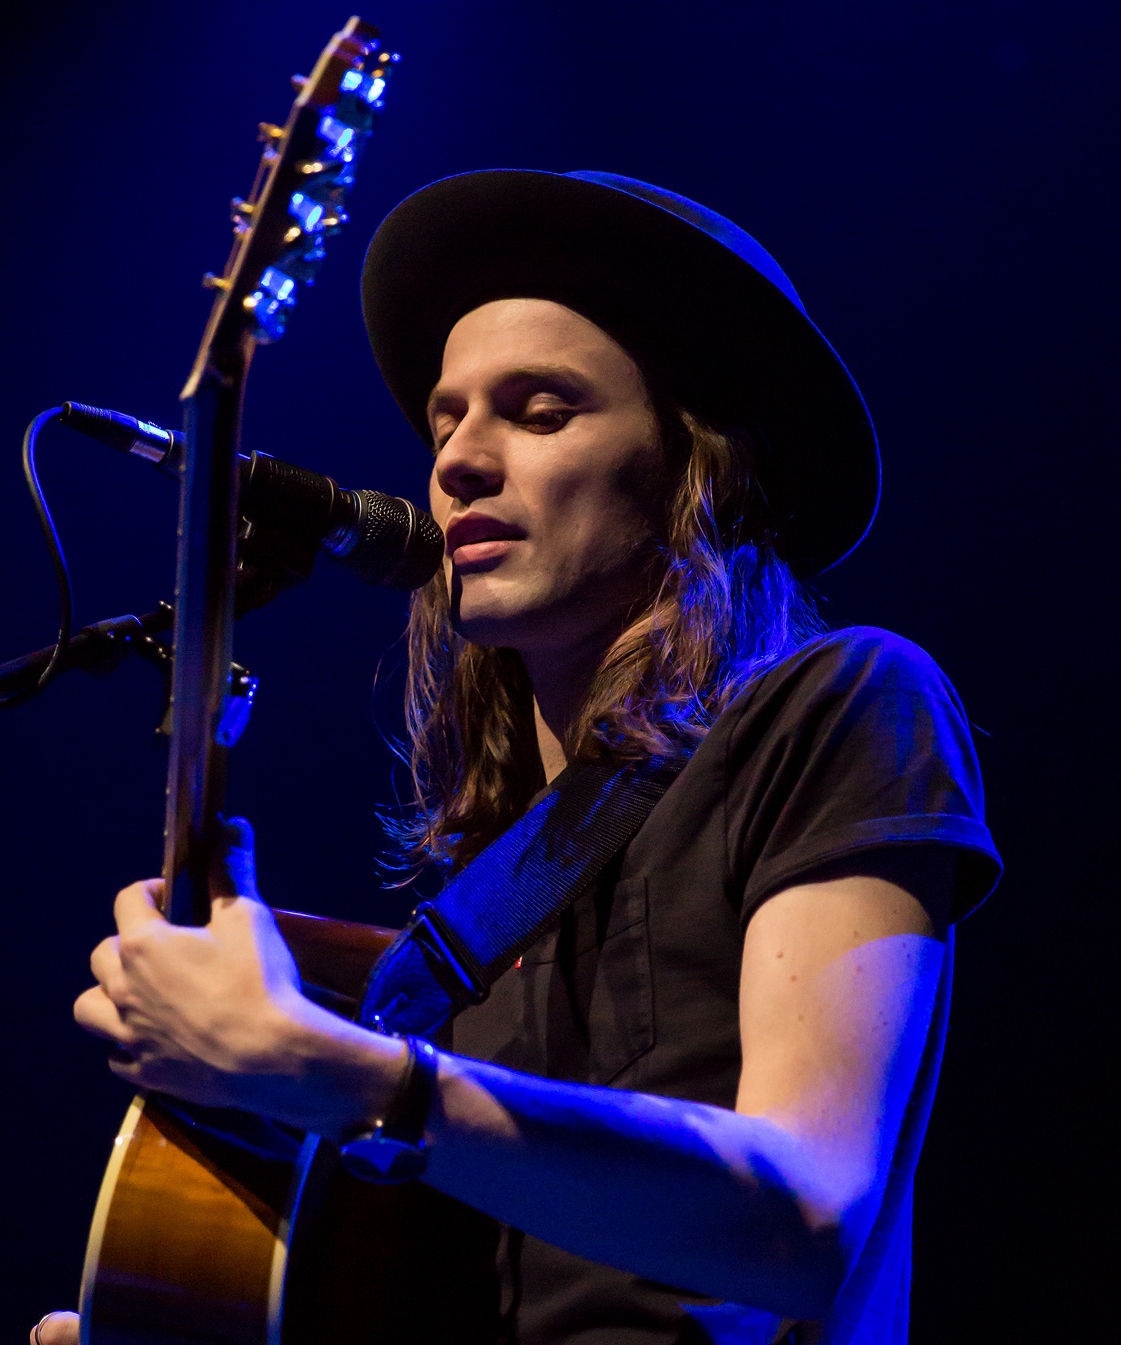 Bay James Guitar Chords Guitar Tabs And Lyrics Songs From Chordie